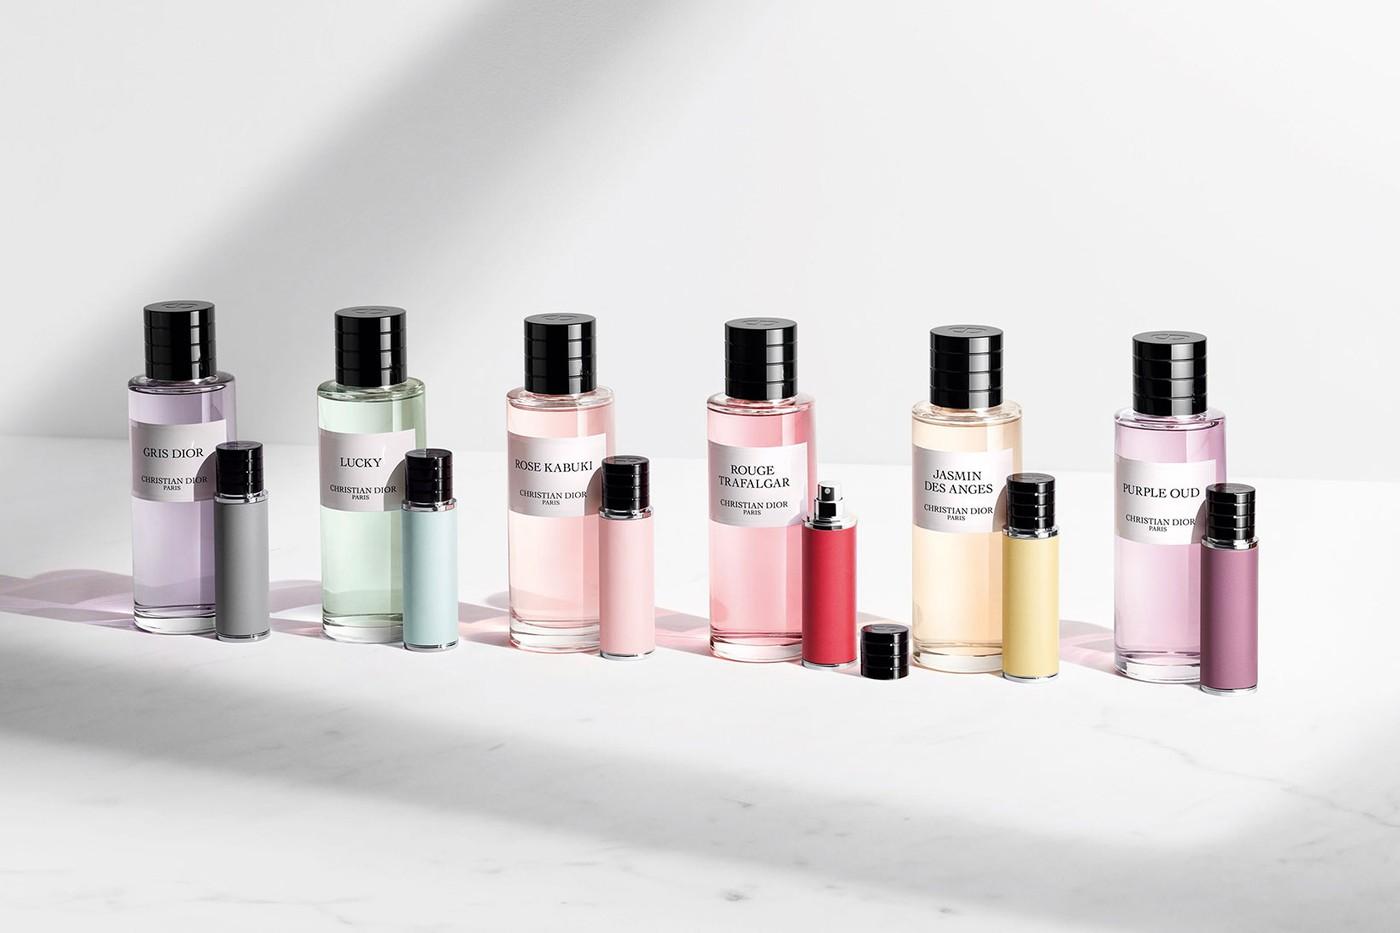 Dior Beauty Purse Spray perfumes refillable bottle